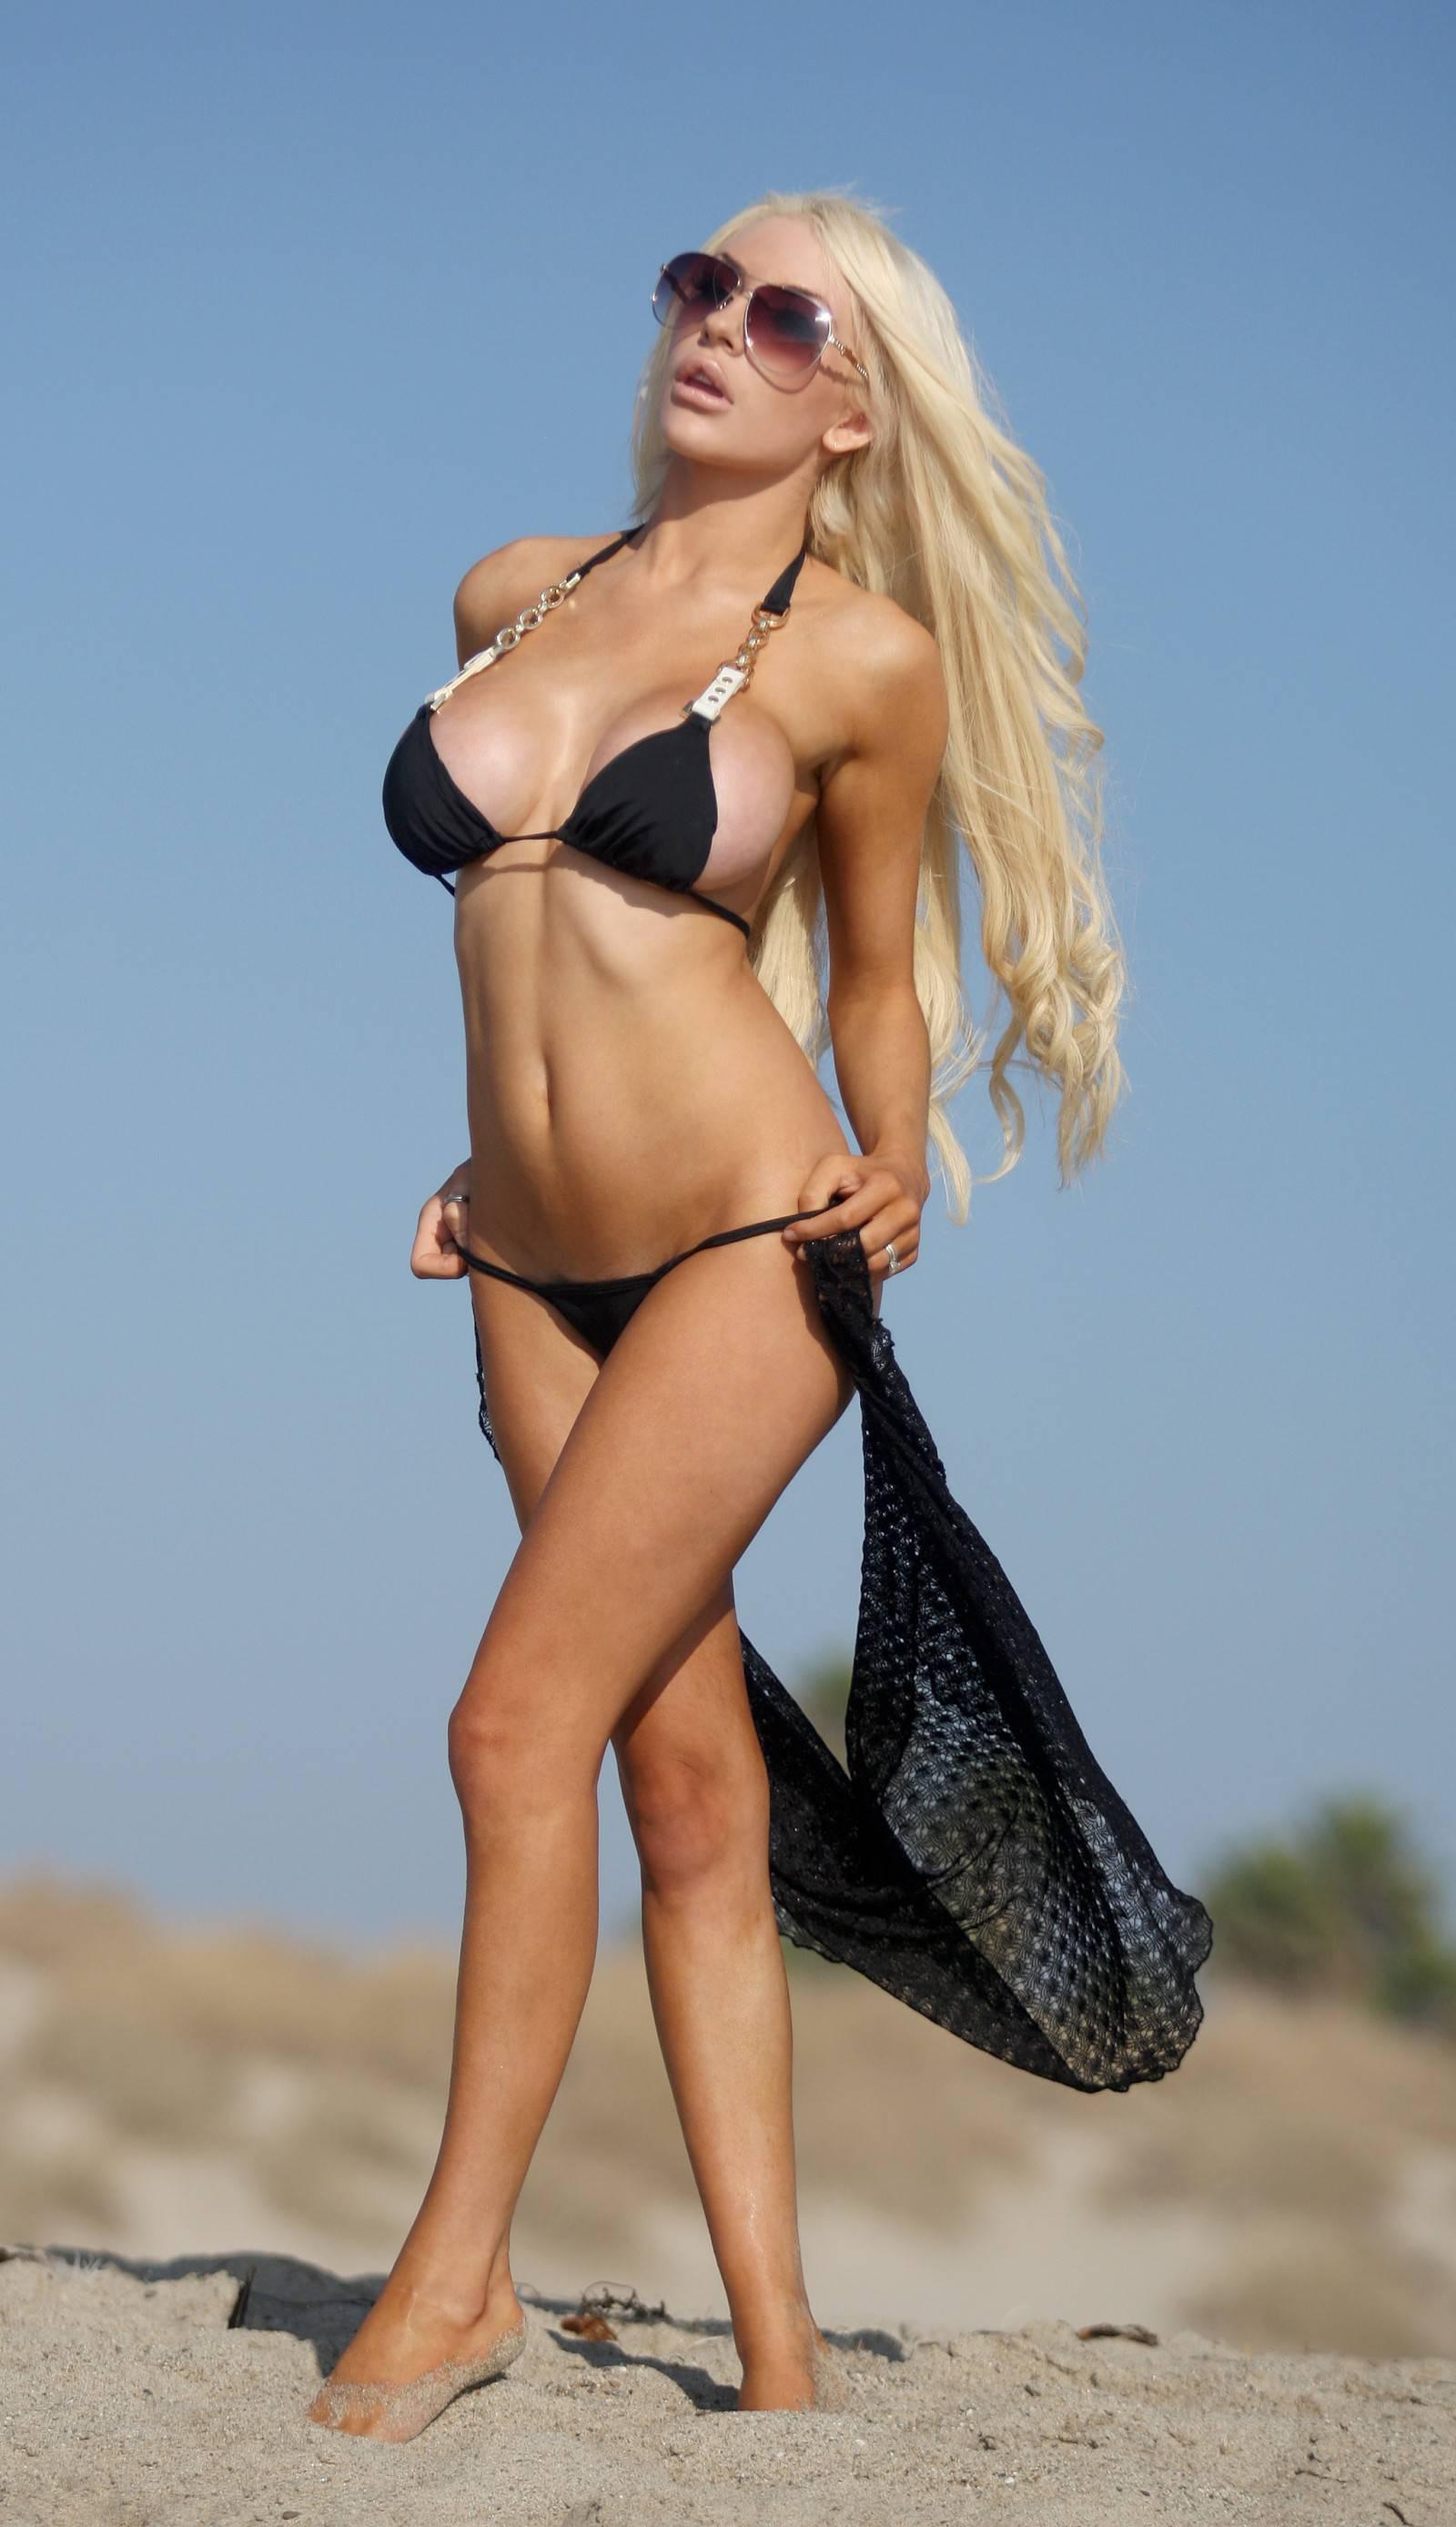 Courtney Stodden Hot Pics photo 2